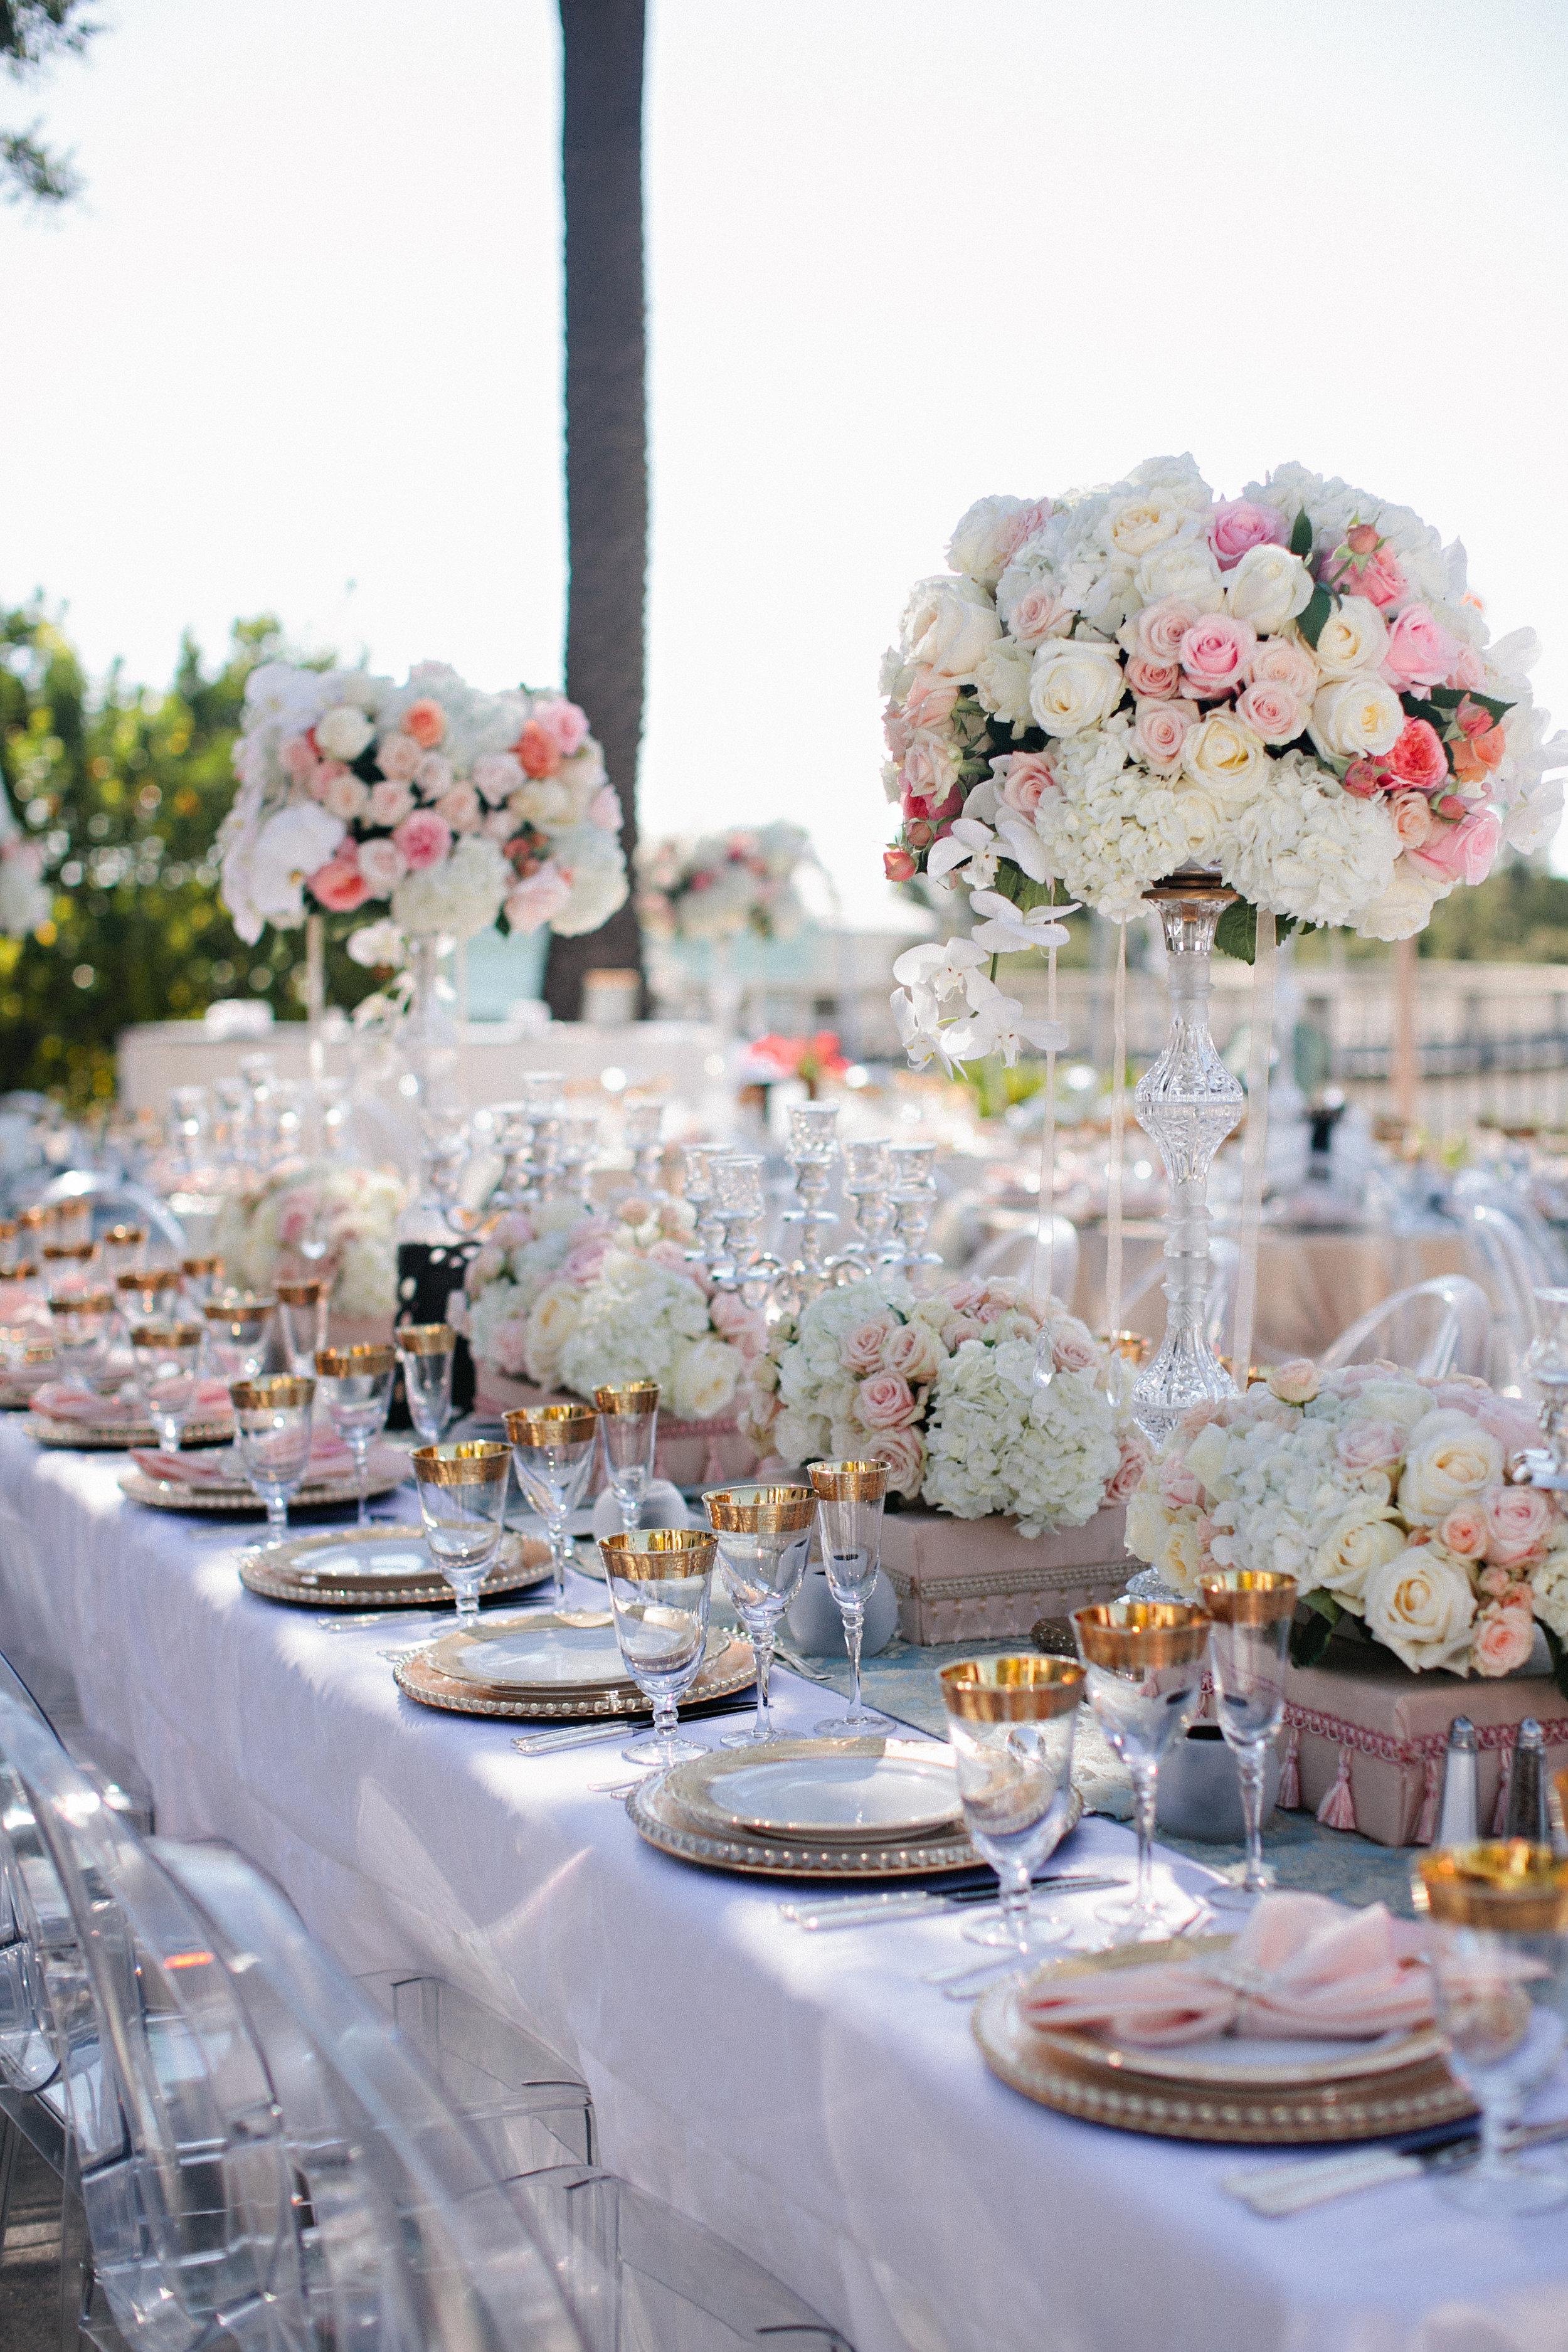 9115_linda_vu_wedding-1616984972-O.jpg